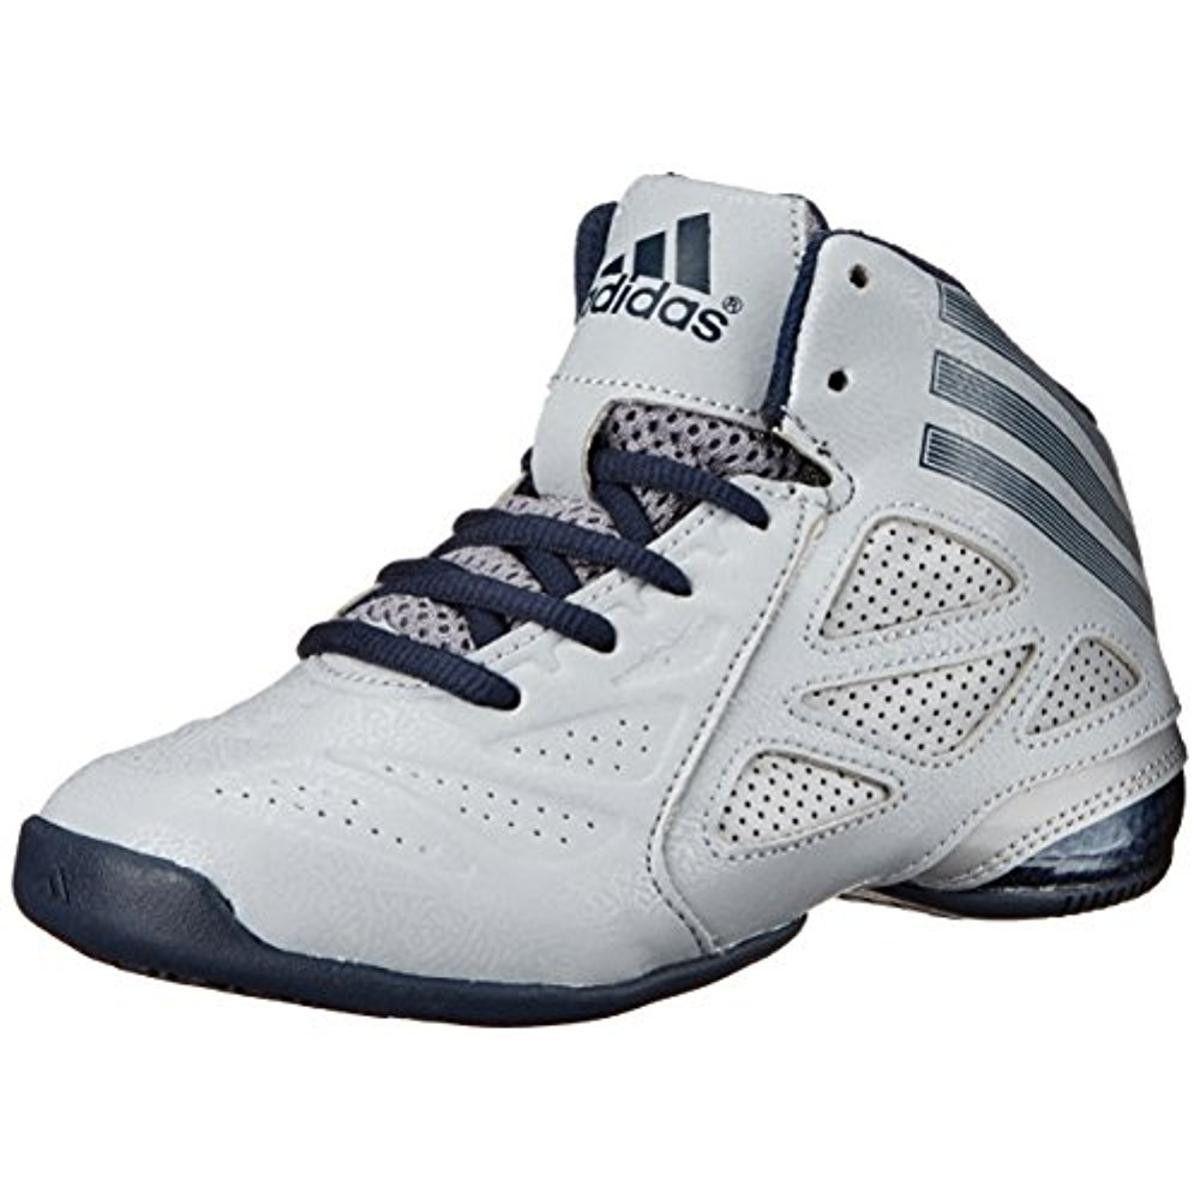 b3938f41b8a438 Adidas Boys Performance Faux Leather Basketball Shoes